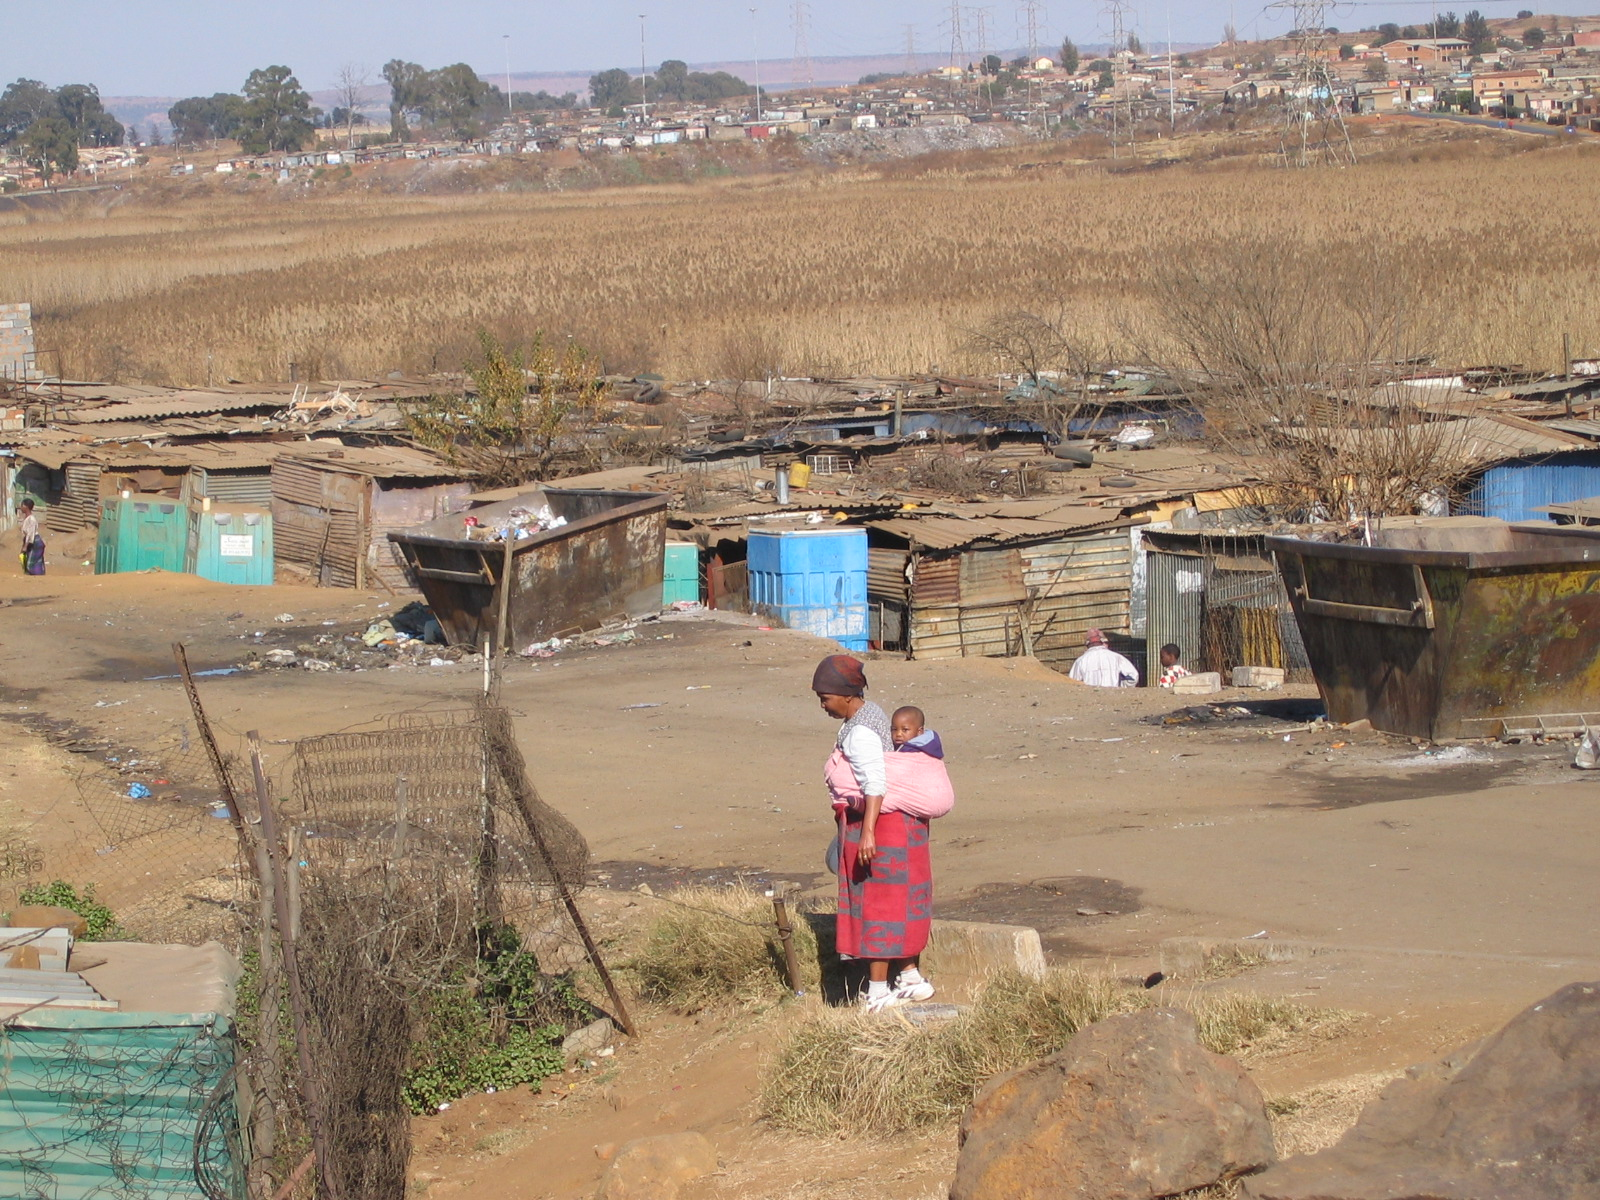 4A1005_apartheid_soweto_bidonville